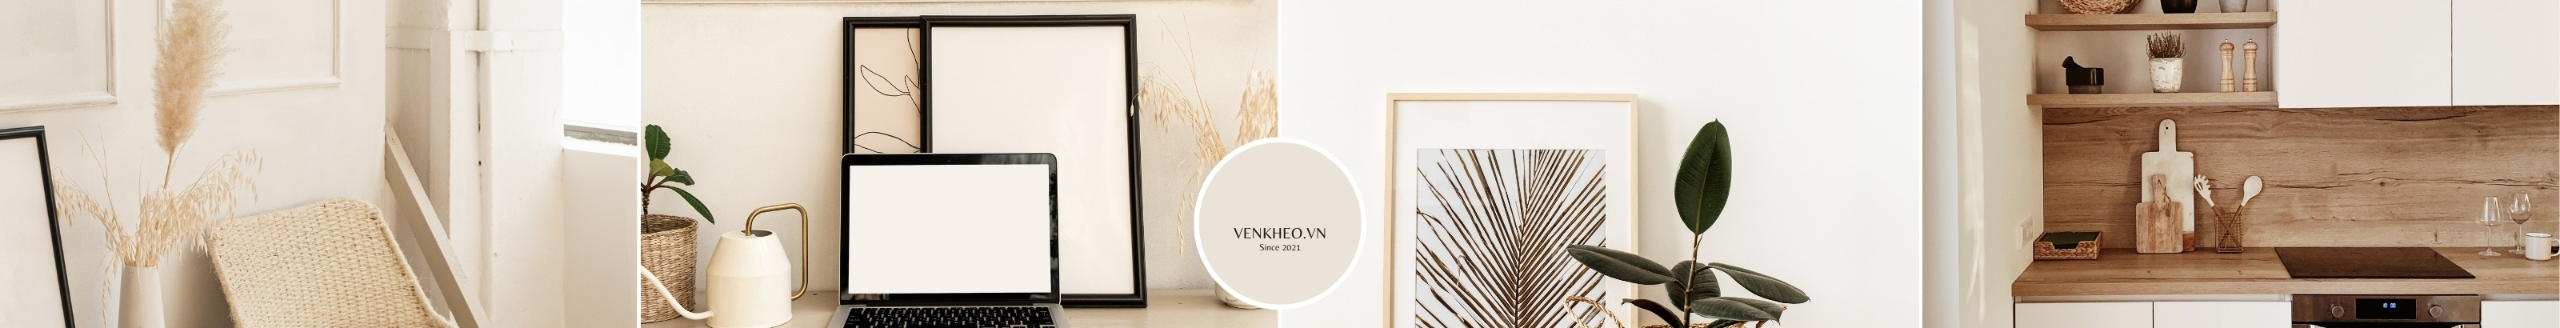 Vén (@venkheovn) Cover Image